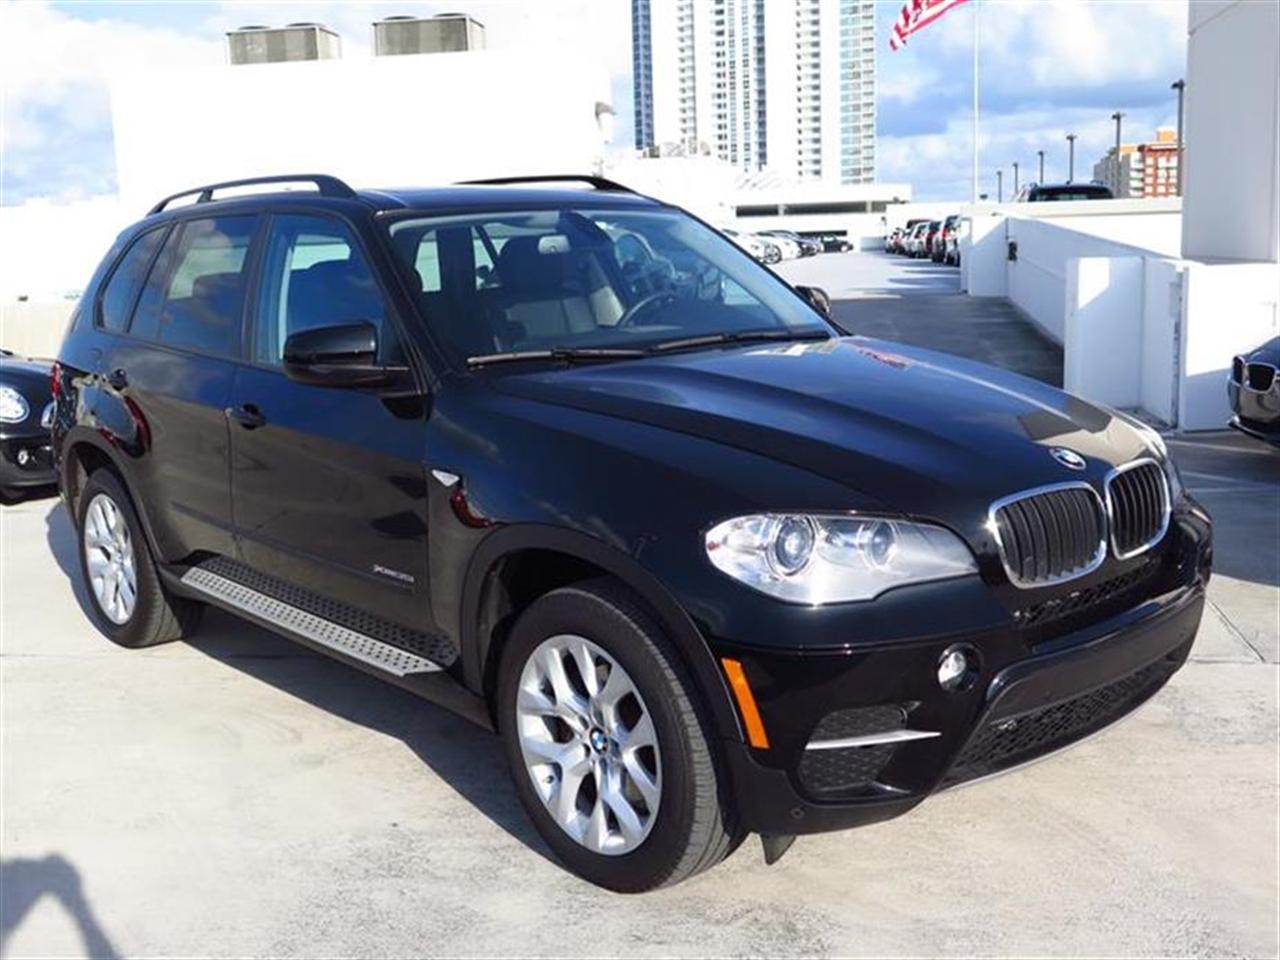 2012 BMW X5 AWD 4dr 35i Premium 4944 miles VIN 5UXZV4C54CL986397